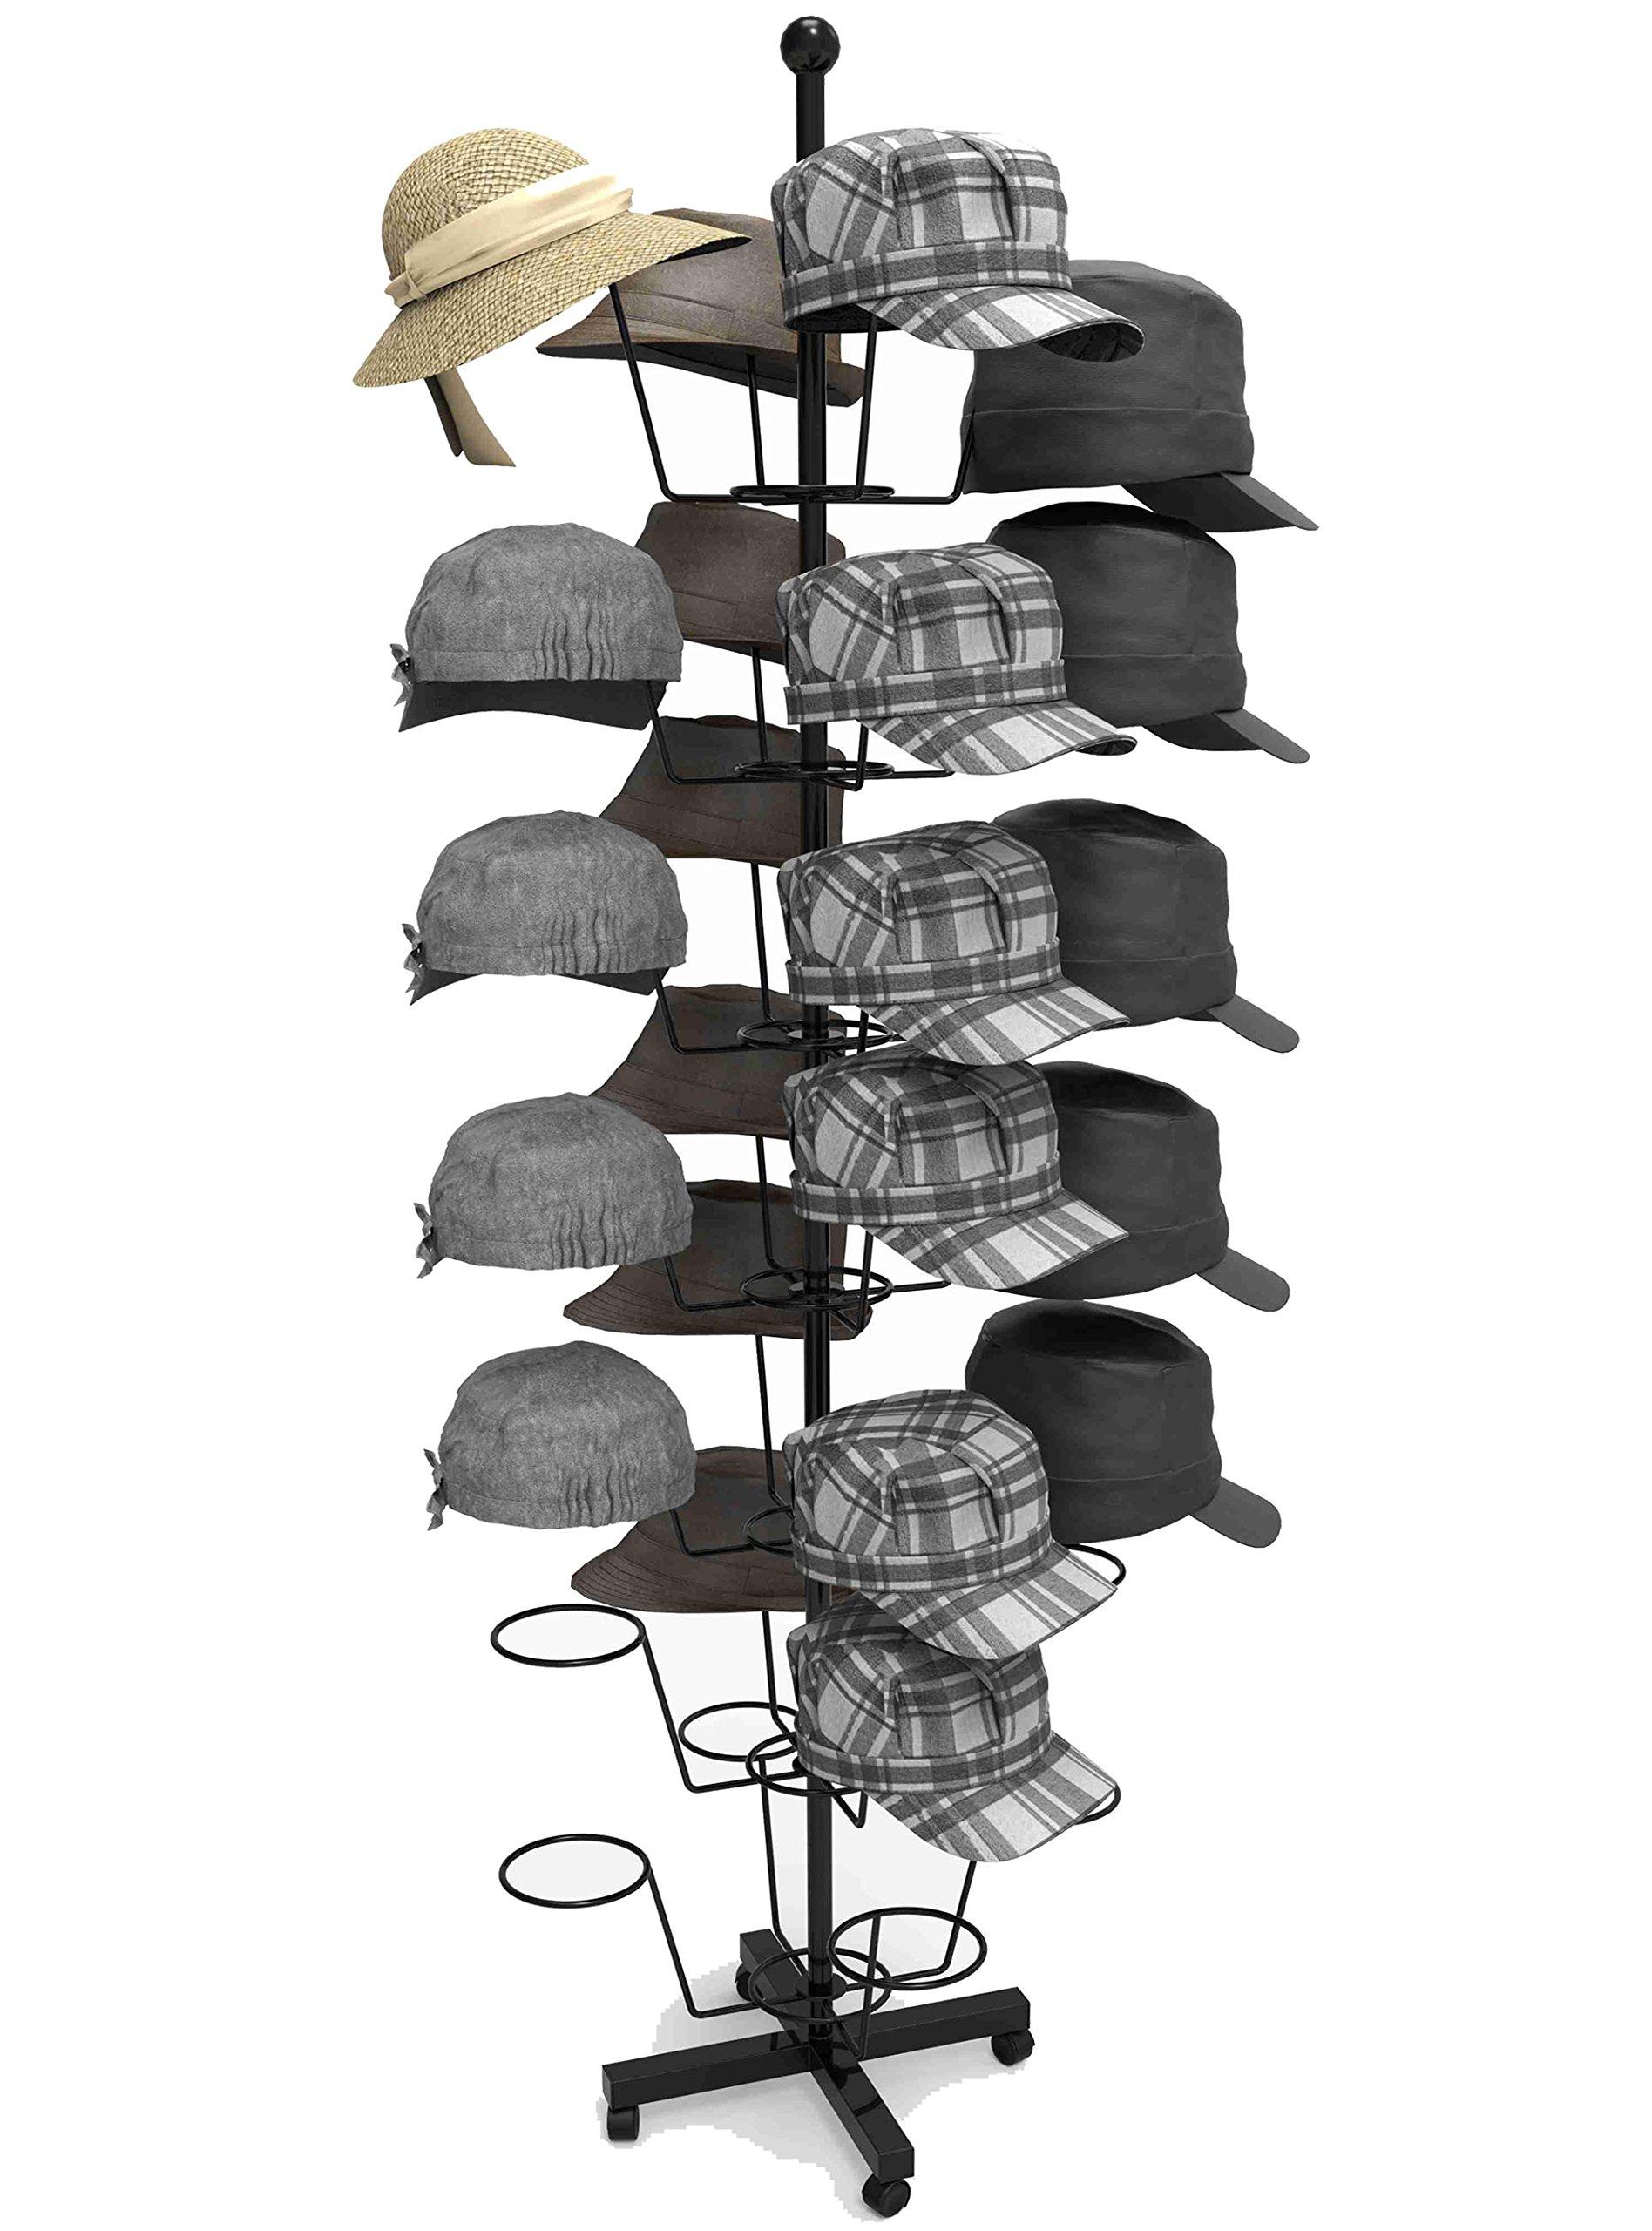 Keland 7-Tier Metal Rotating Adjustable Cap Display Rack 35 Hold Retail Hat Stand Holder Hanger Organizer, US Stock